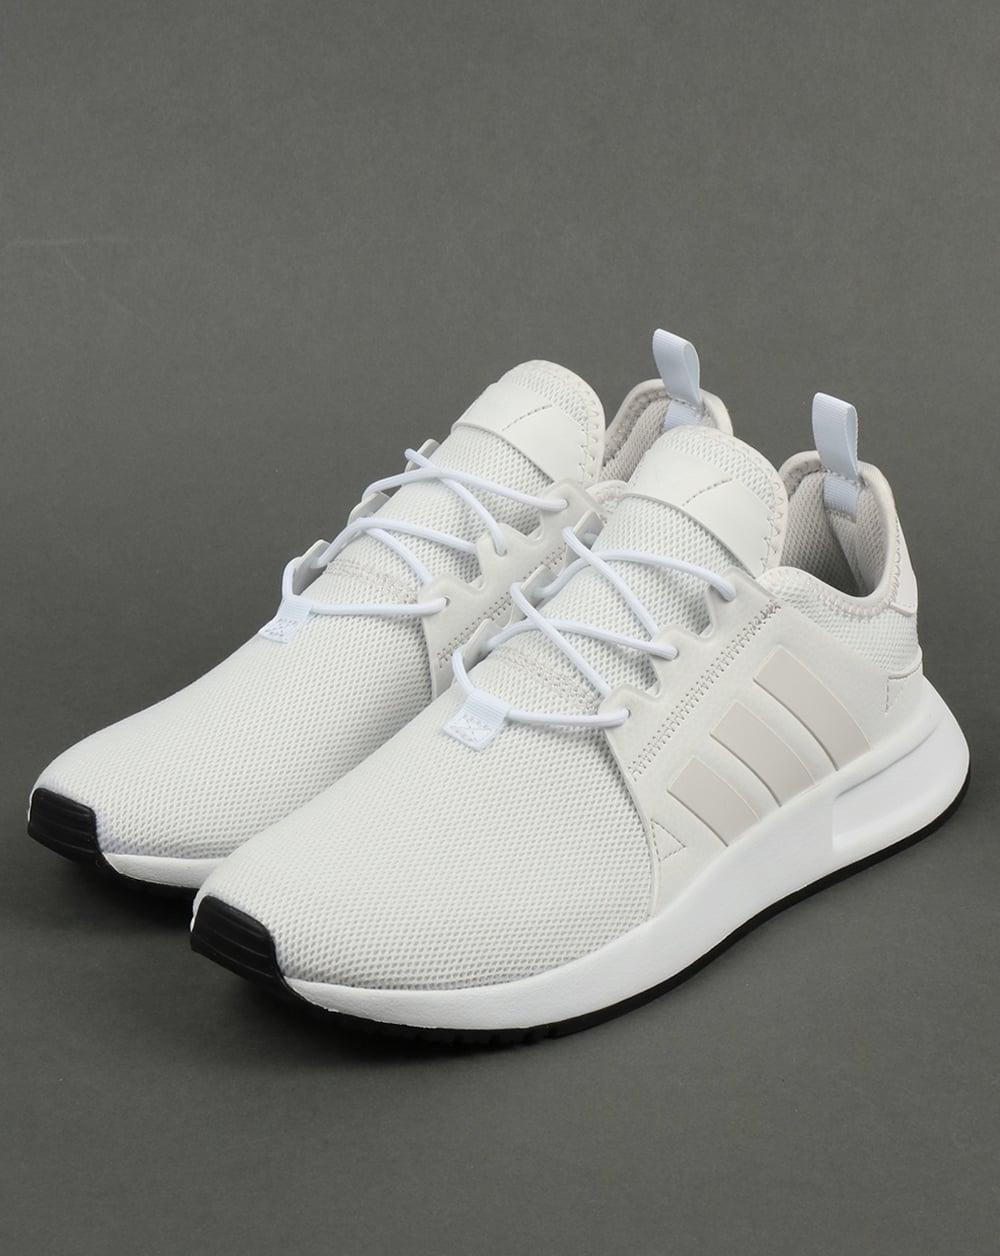 Adidas XPLR Trainers Vintage White,originals,shoes,running ...